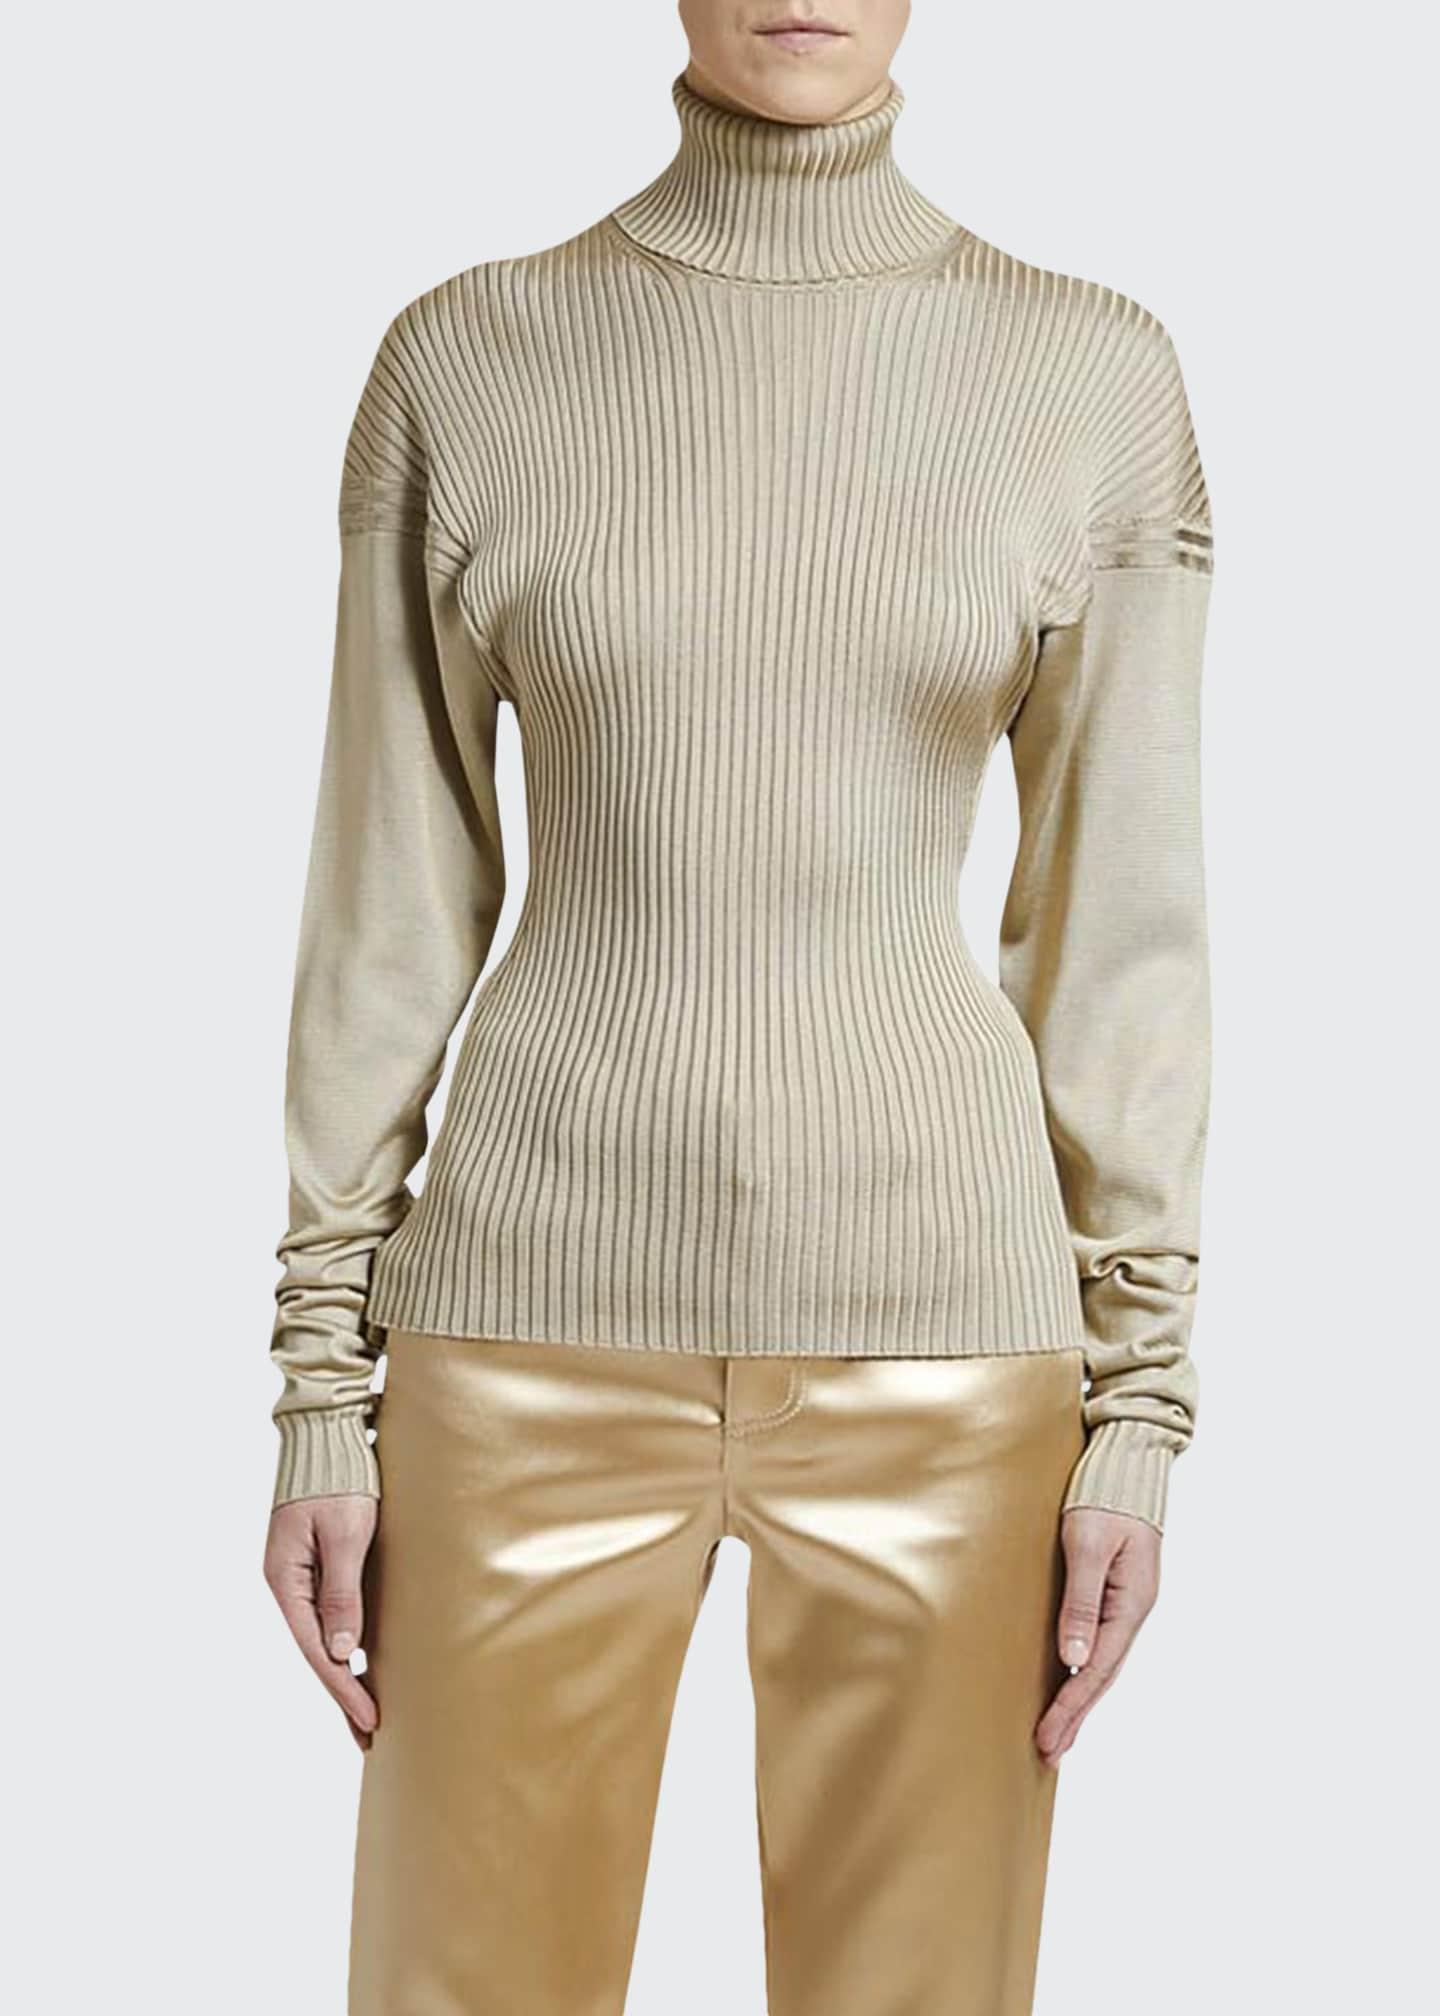 Bottega Veneta Ribbed-Silk Turtleneck Sweater